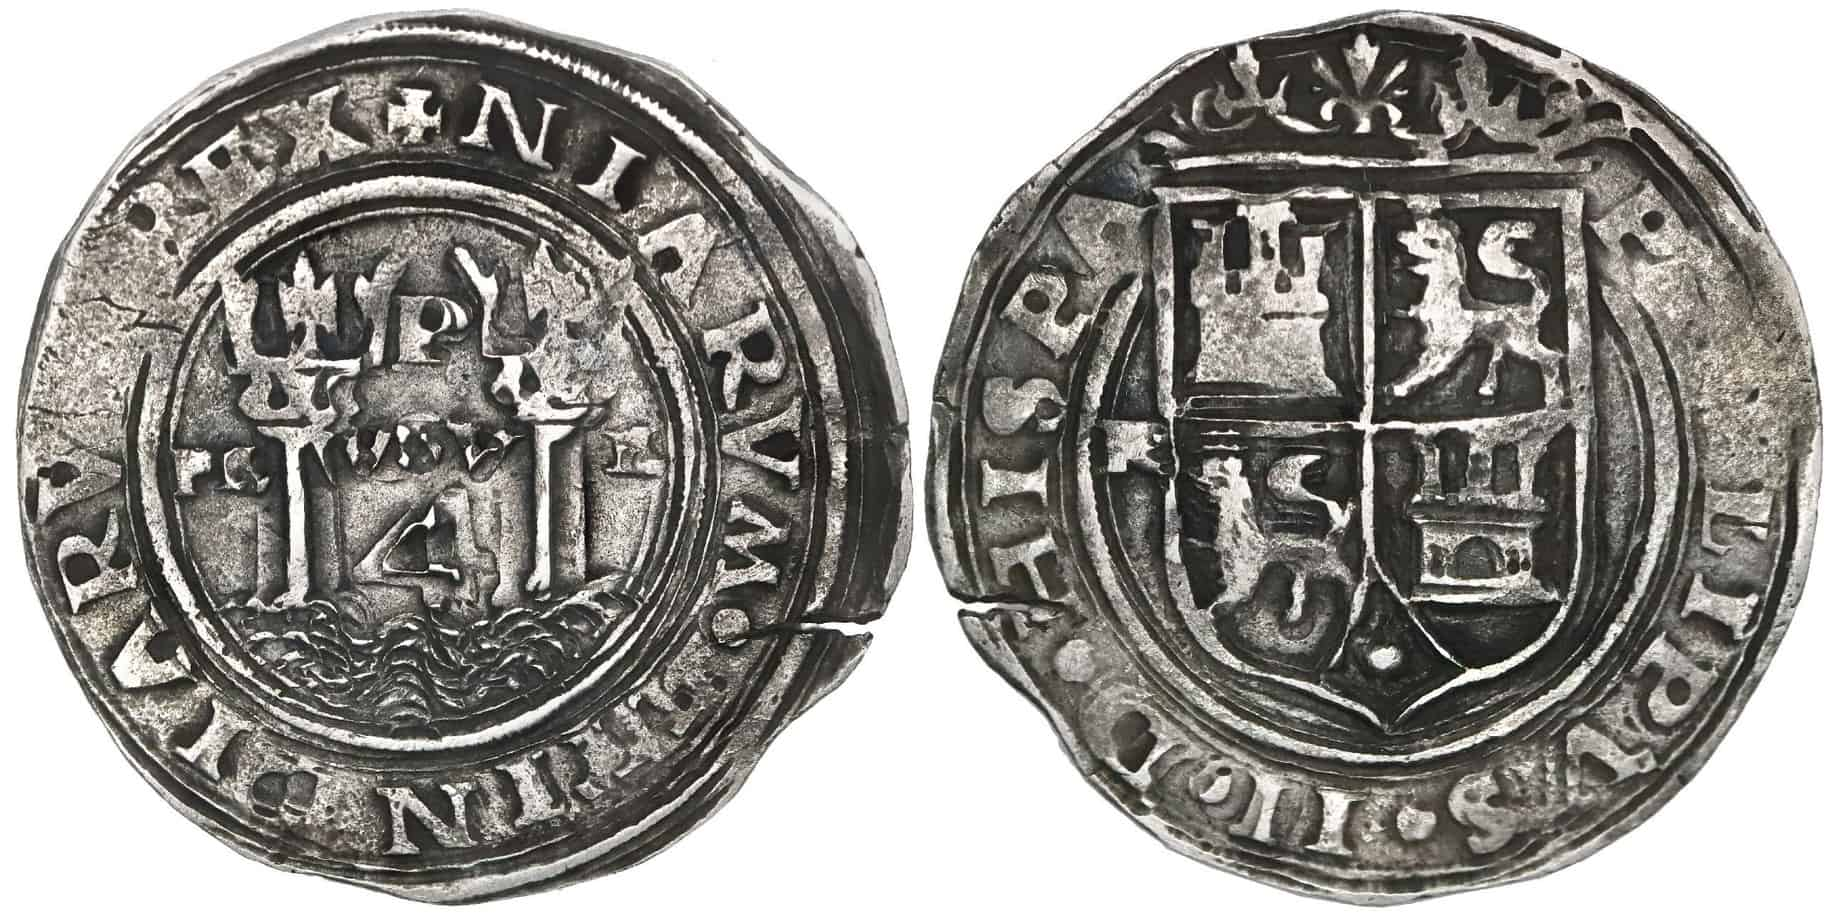 4 reales Lima, R pequeña. PL-VSV-L. HISPA/NIARVM.